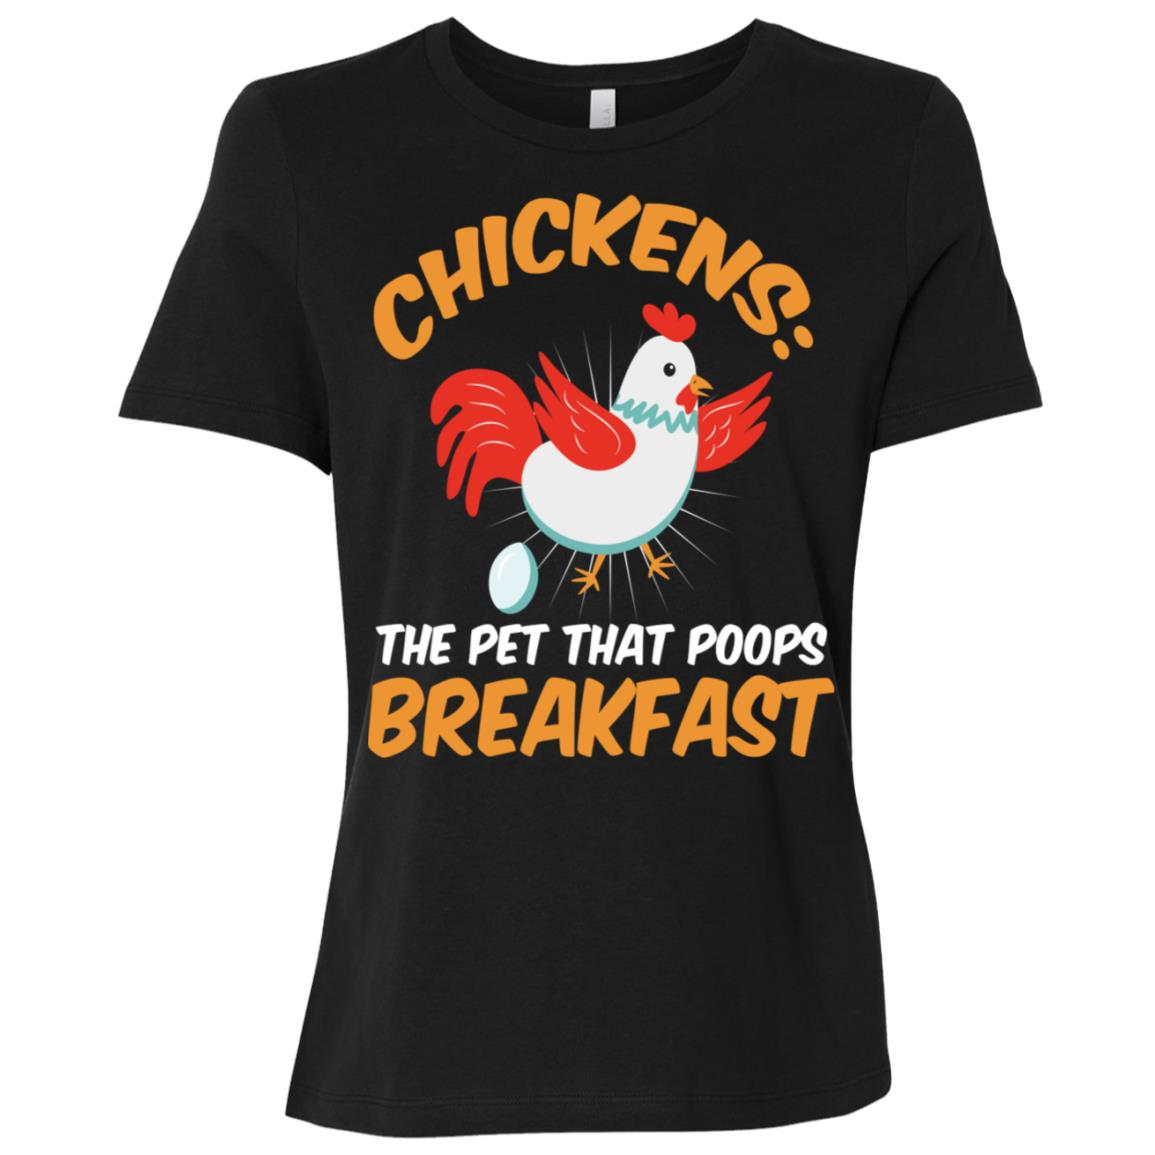 Hen Rooster Chick Farmer Market Poultry Women Short Sleeve T-Shirt